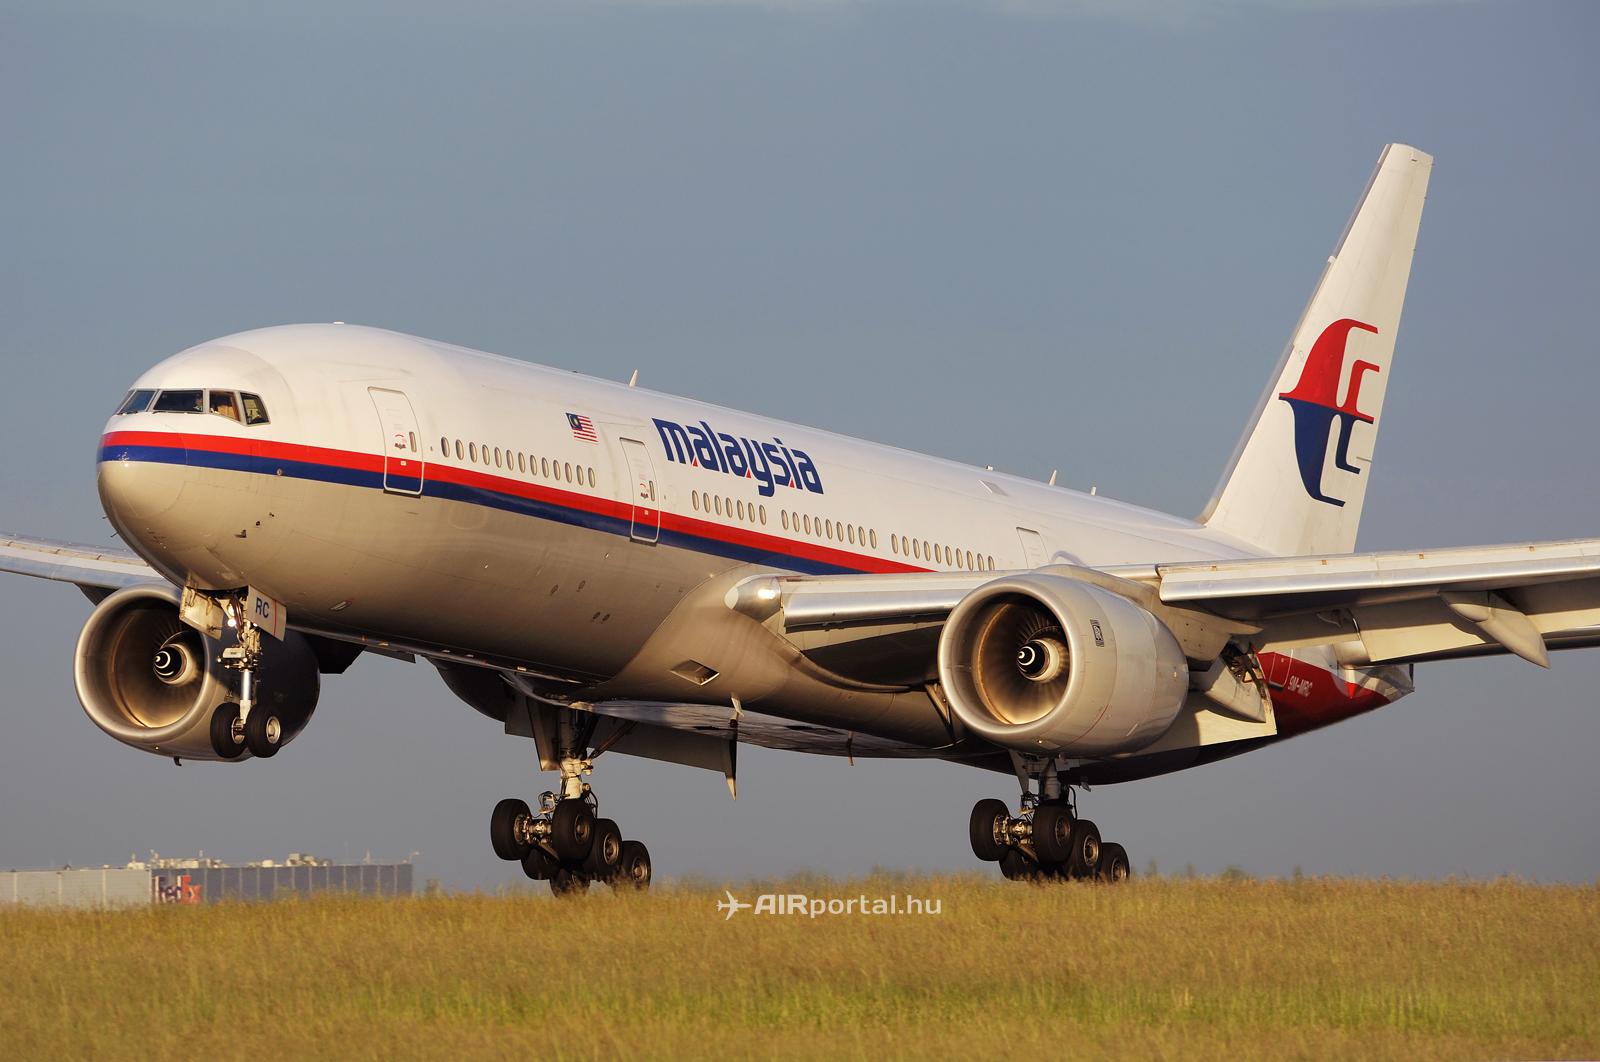 A Malaysian Airlines Boeing 777-200ER típusú repülőgépe a párizsi Charles de Gaulle repülőterén. (Fotó: Kovács Gábor - AIRportal.hu) | © AIRportal.hu